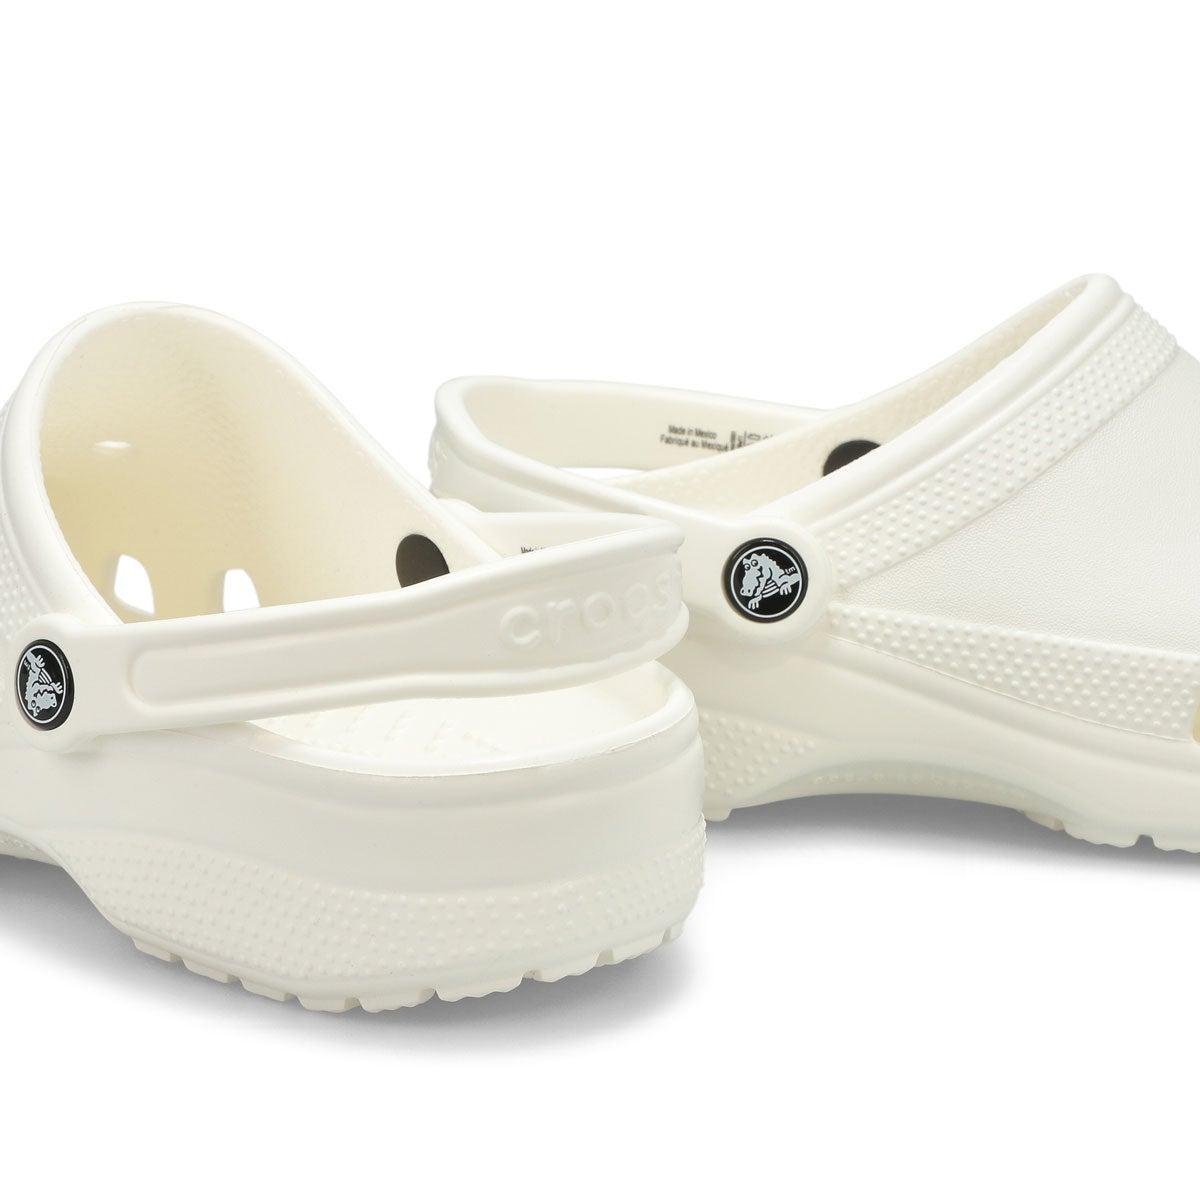 Men's Classic EVA Clog - White